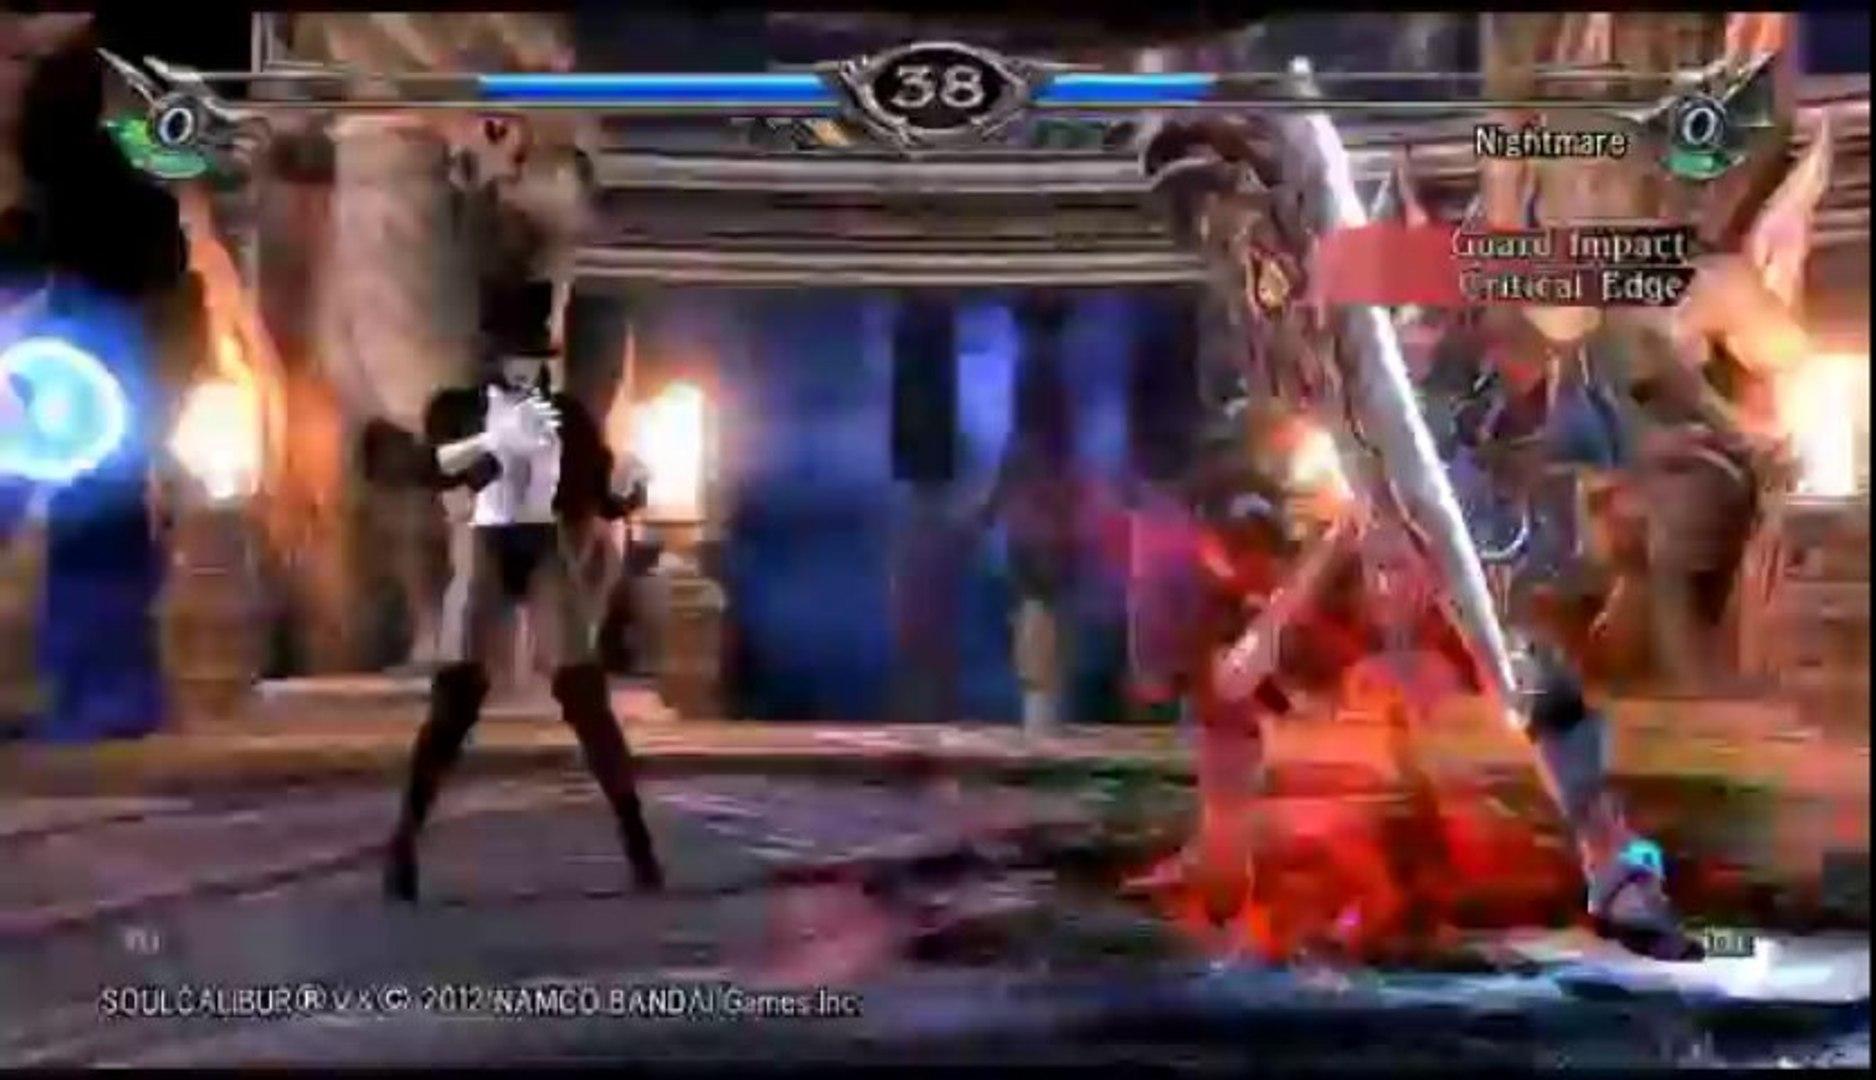 Soul Calibur V | Ranked Online Match - Zatanna Versus Nightmare